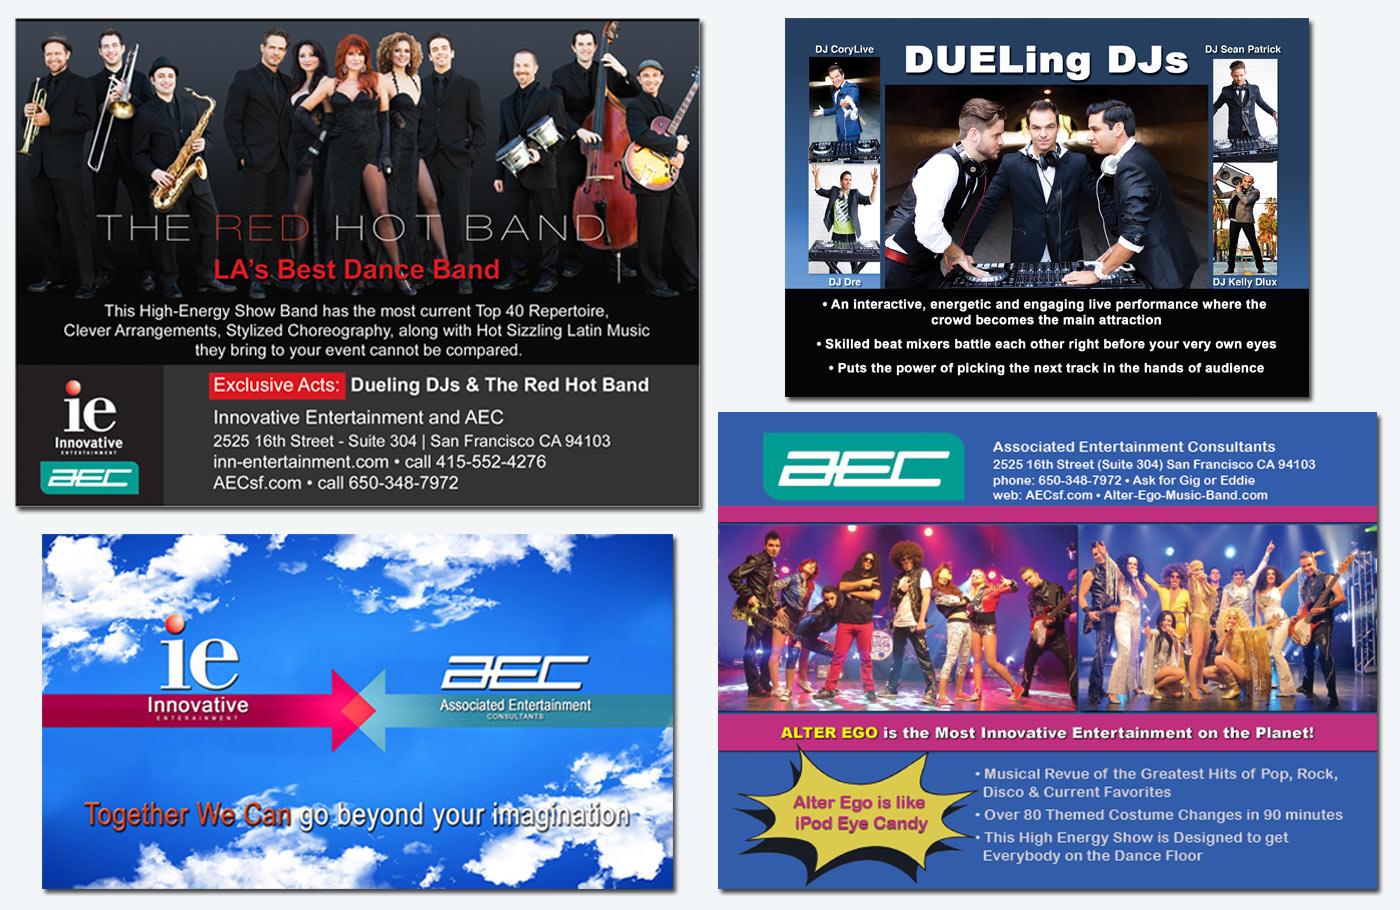 Associated Entertainment Consultants